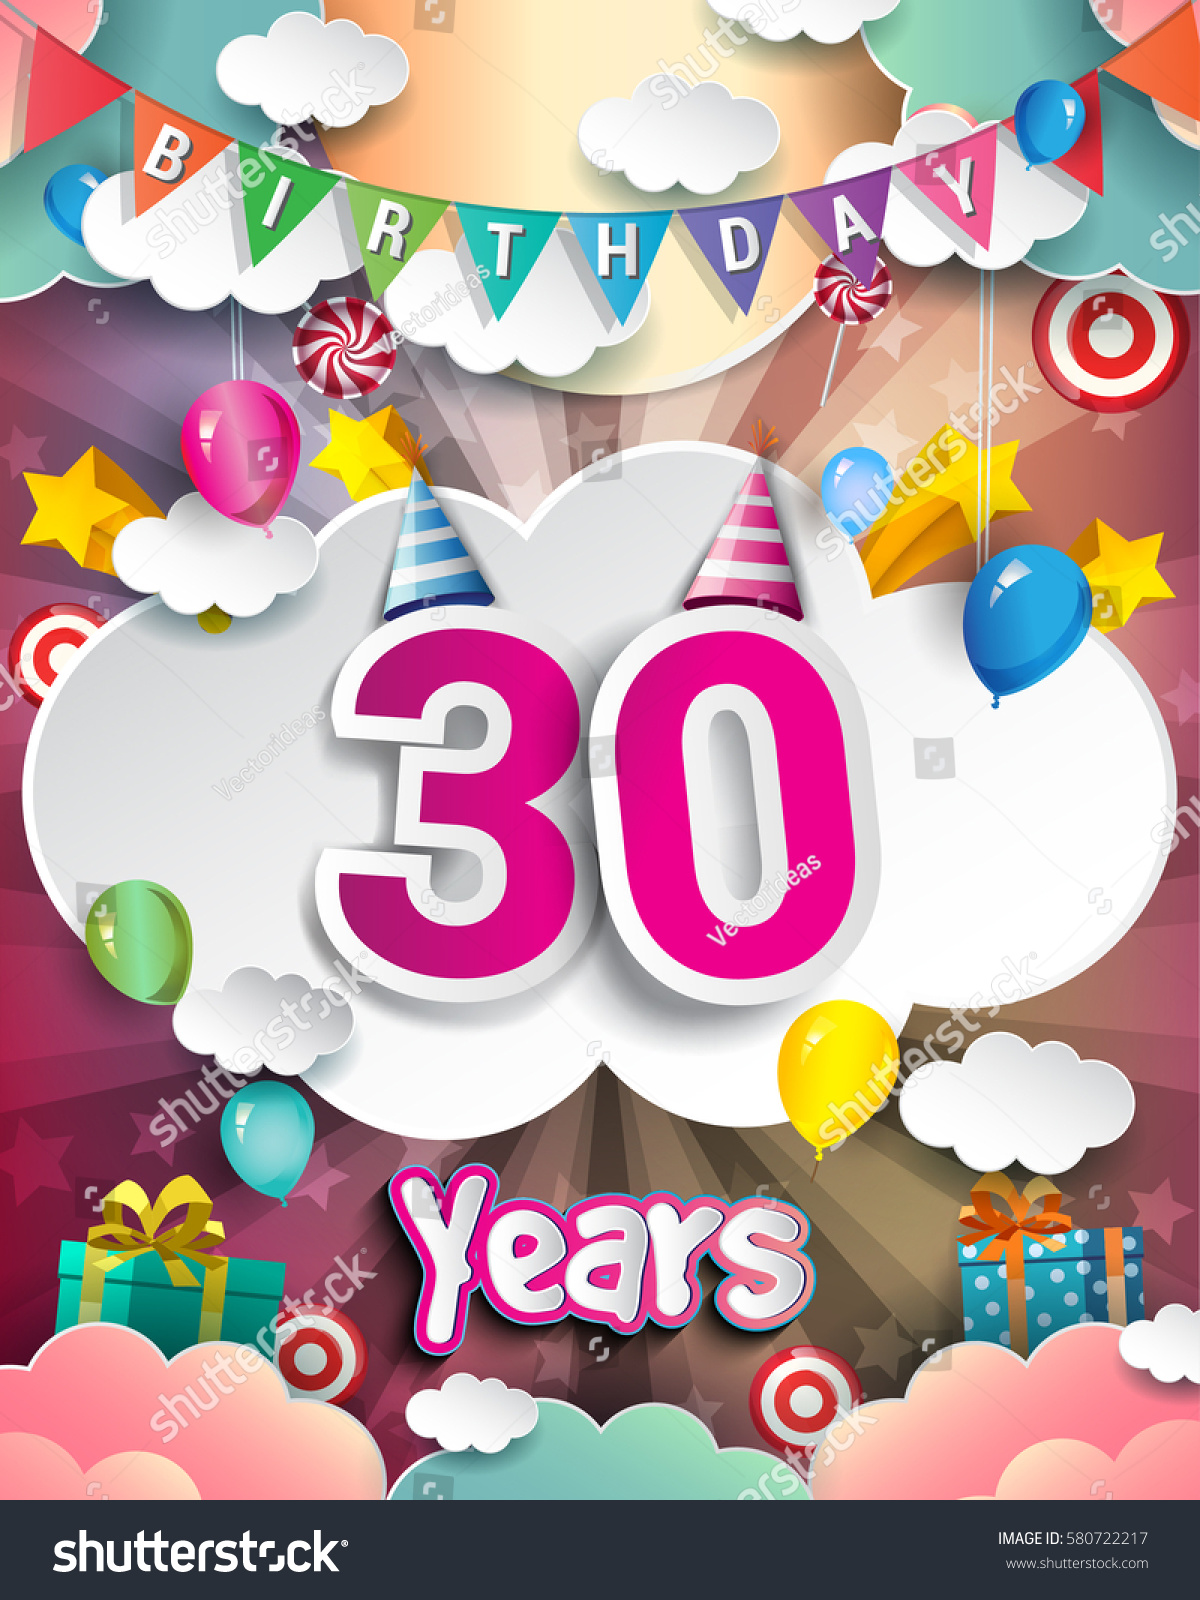 30th Birthday Celebration Greeting Card Design Stock Vector 2018